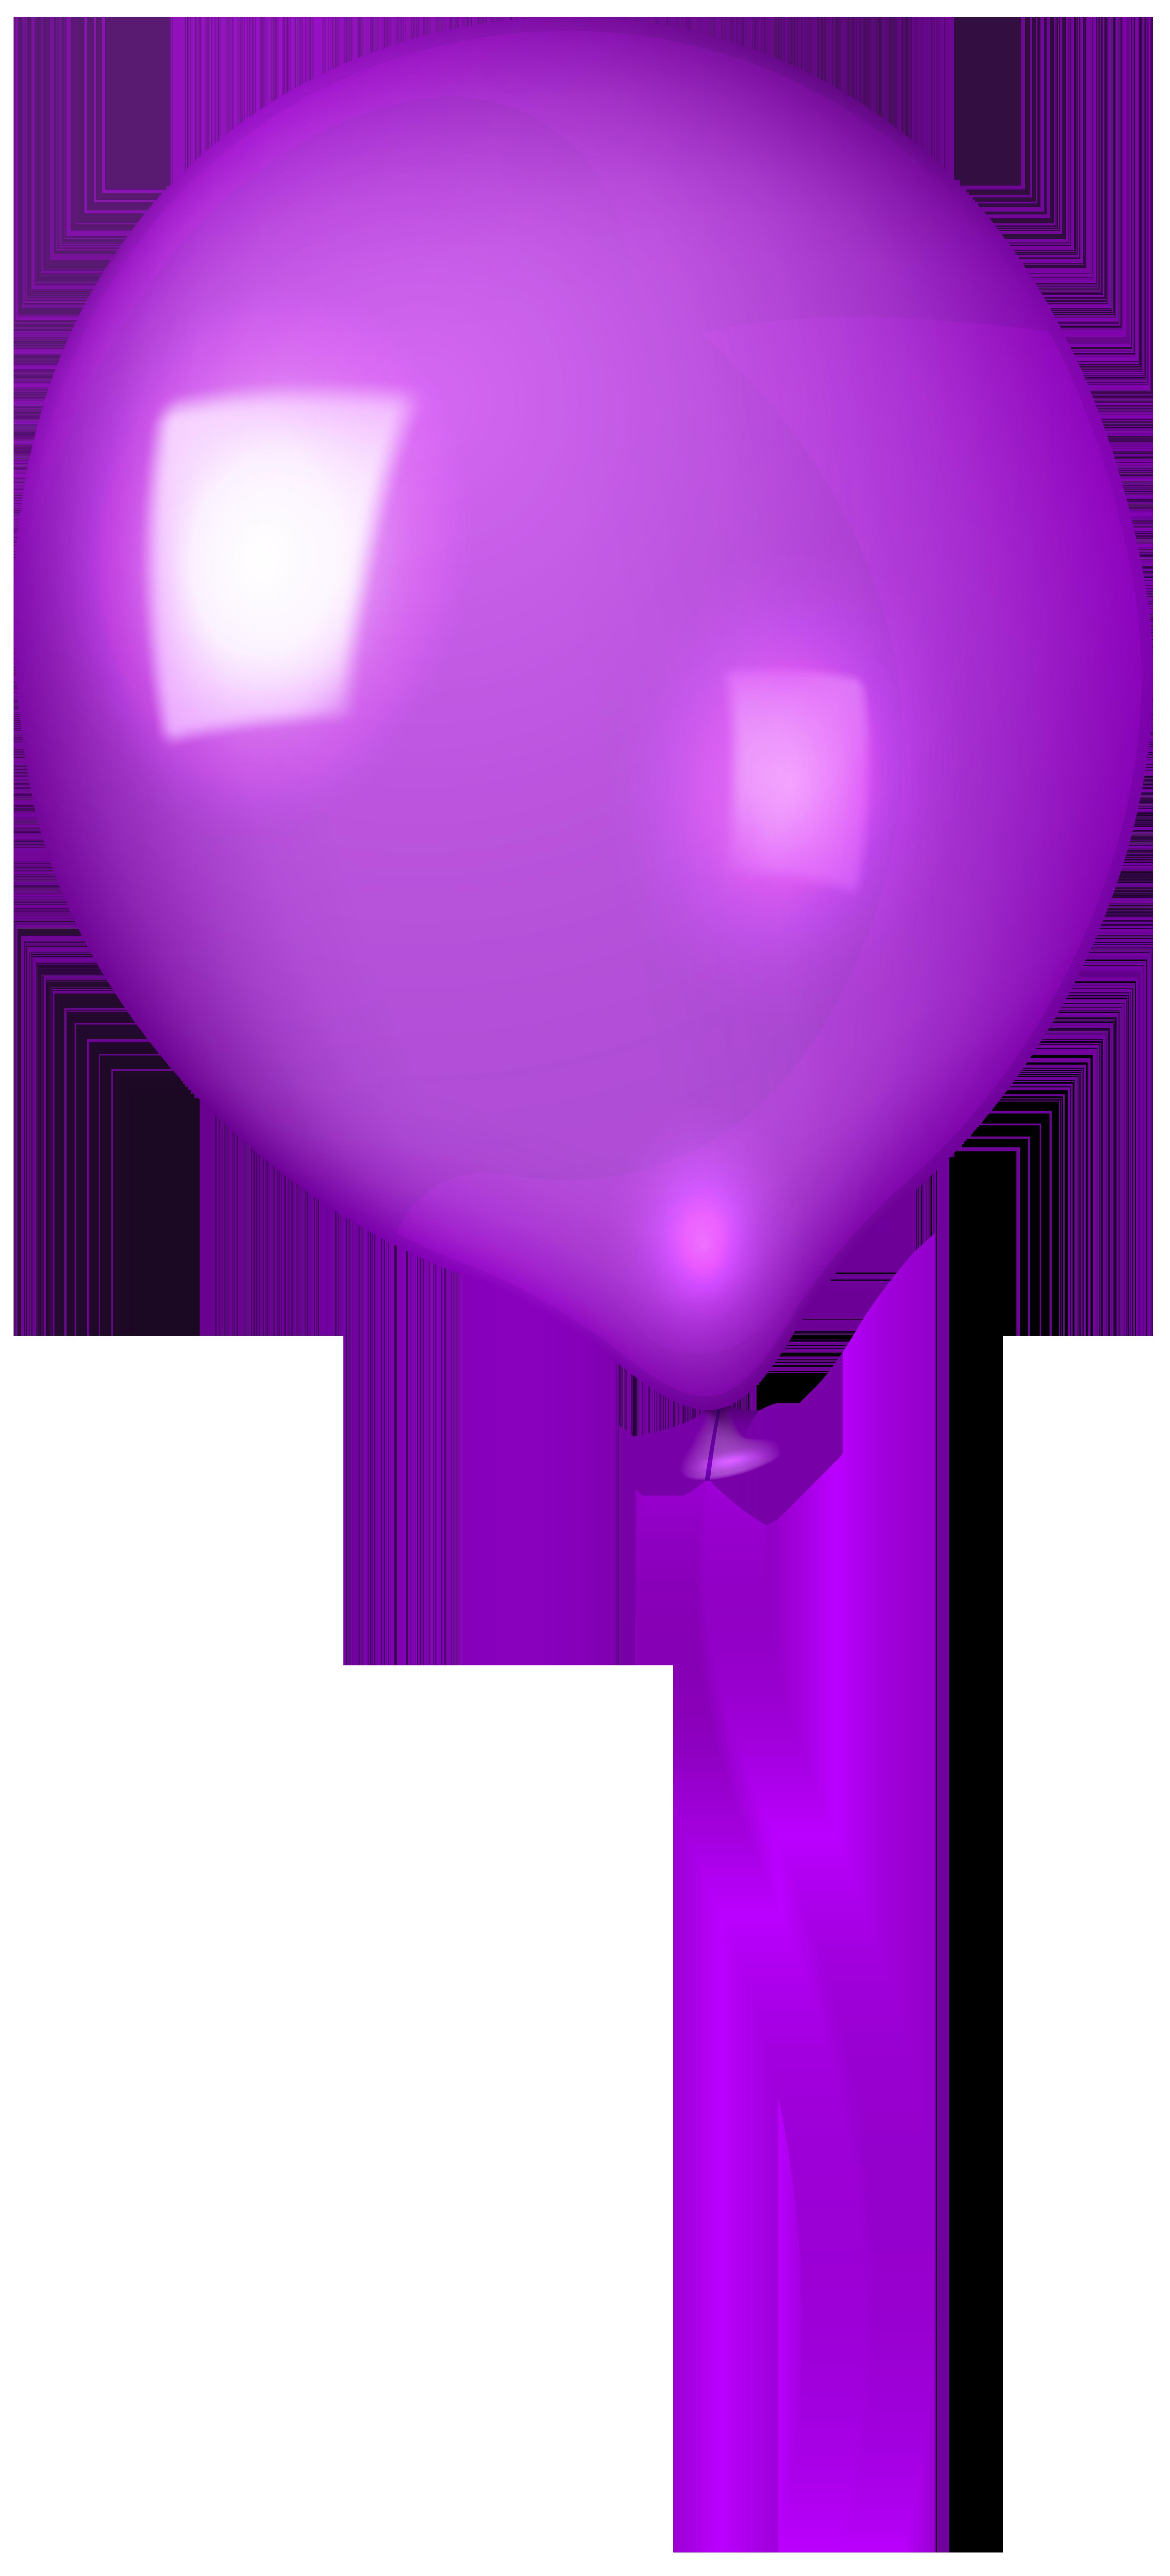 Ballon clipart purple. Balloon clip art image